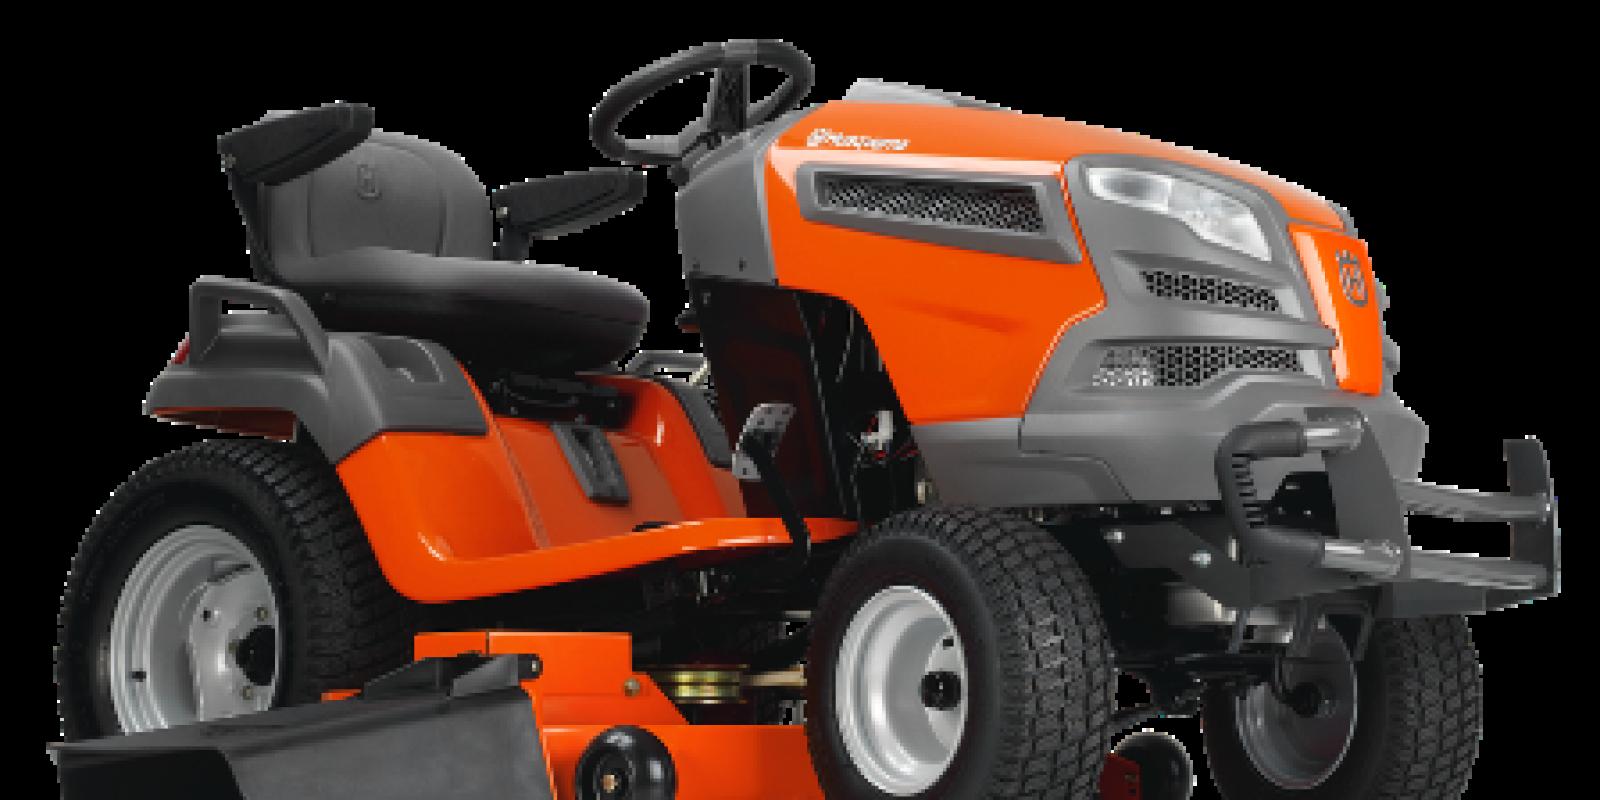 Husqvarna Garden Tractor Gth52xls Satisfy Your Mow Tow